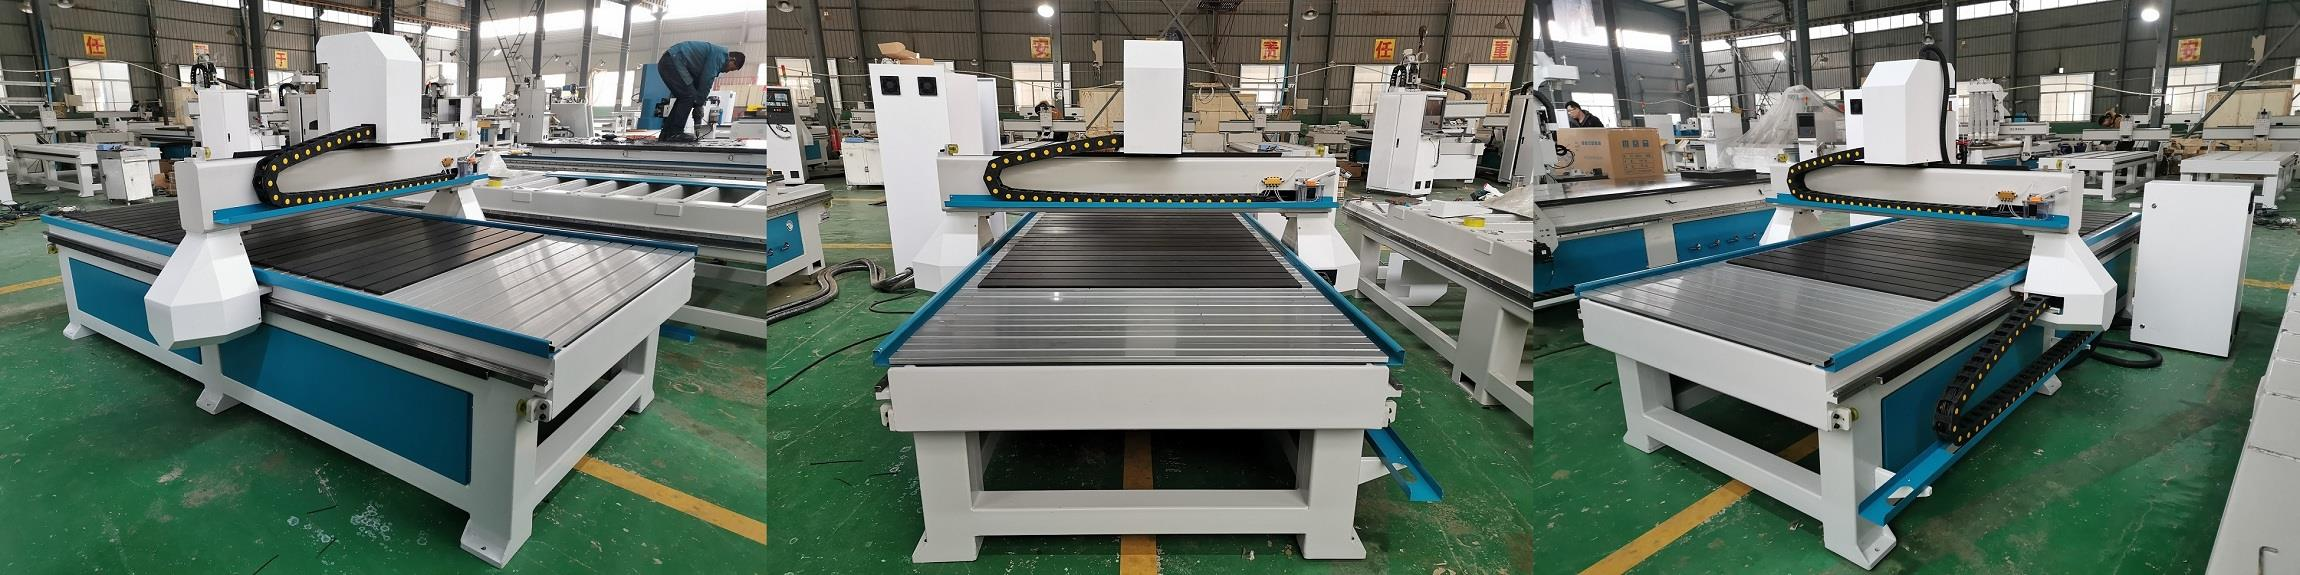 Wood Engraver CNC